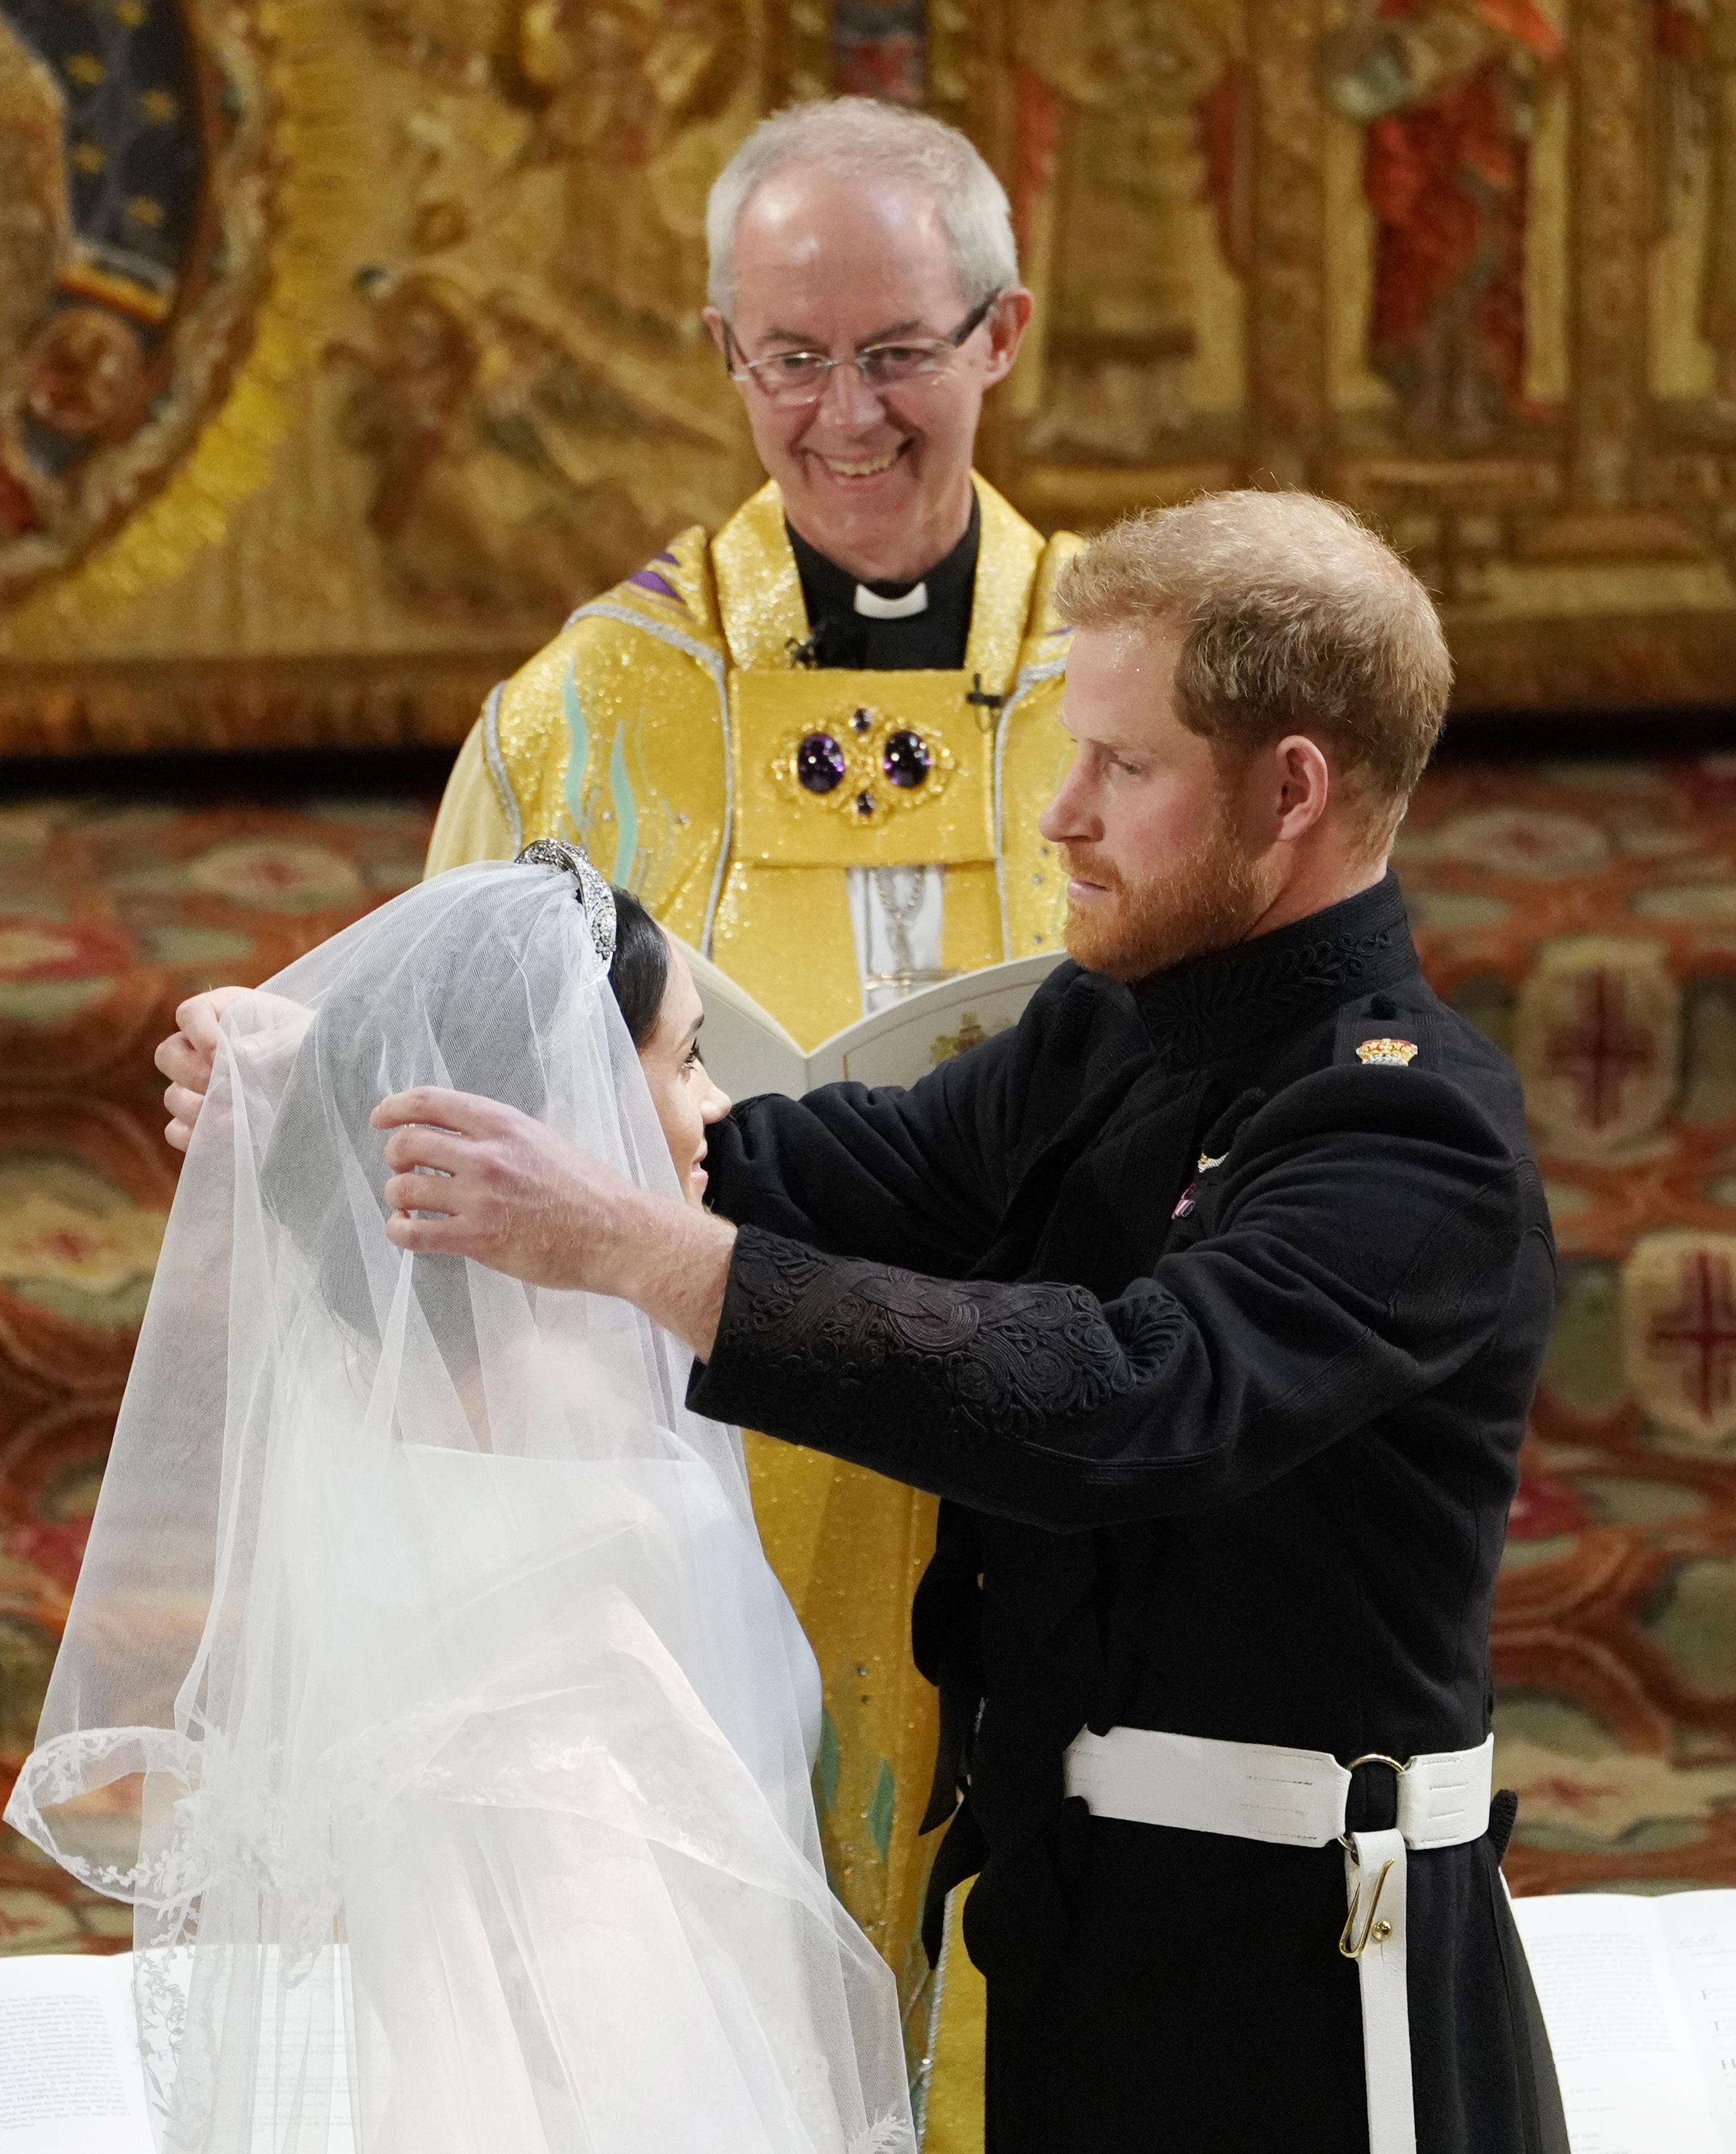 arcebispo-de-canterbury-casamento-meghan-markle-principe-harry